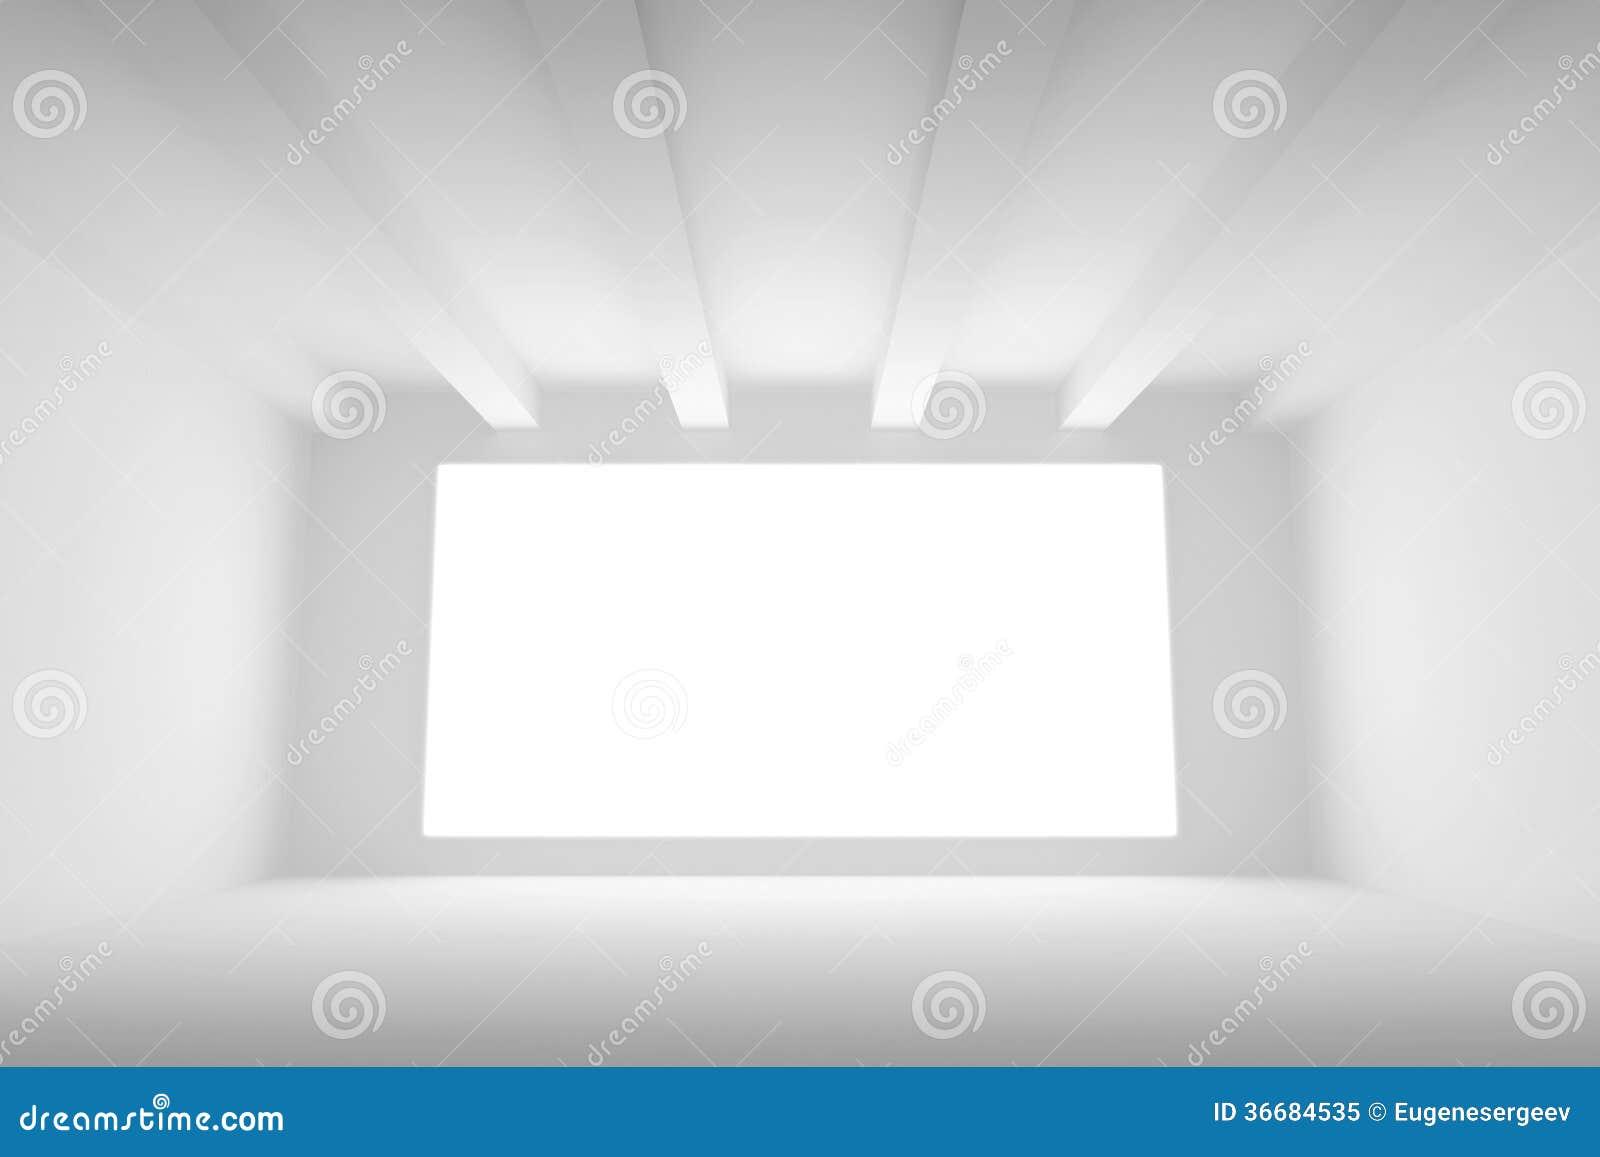 Empty White Room Cinema D Download